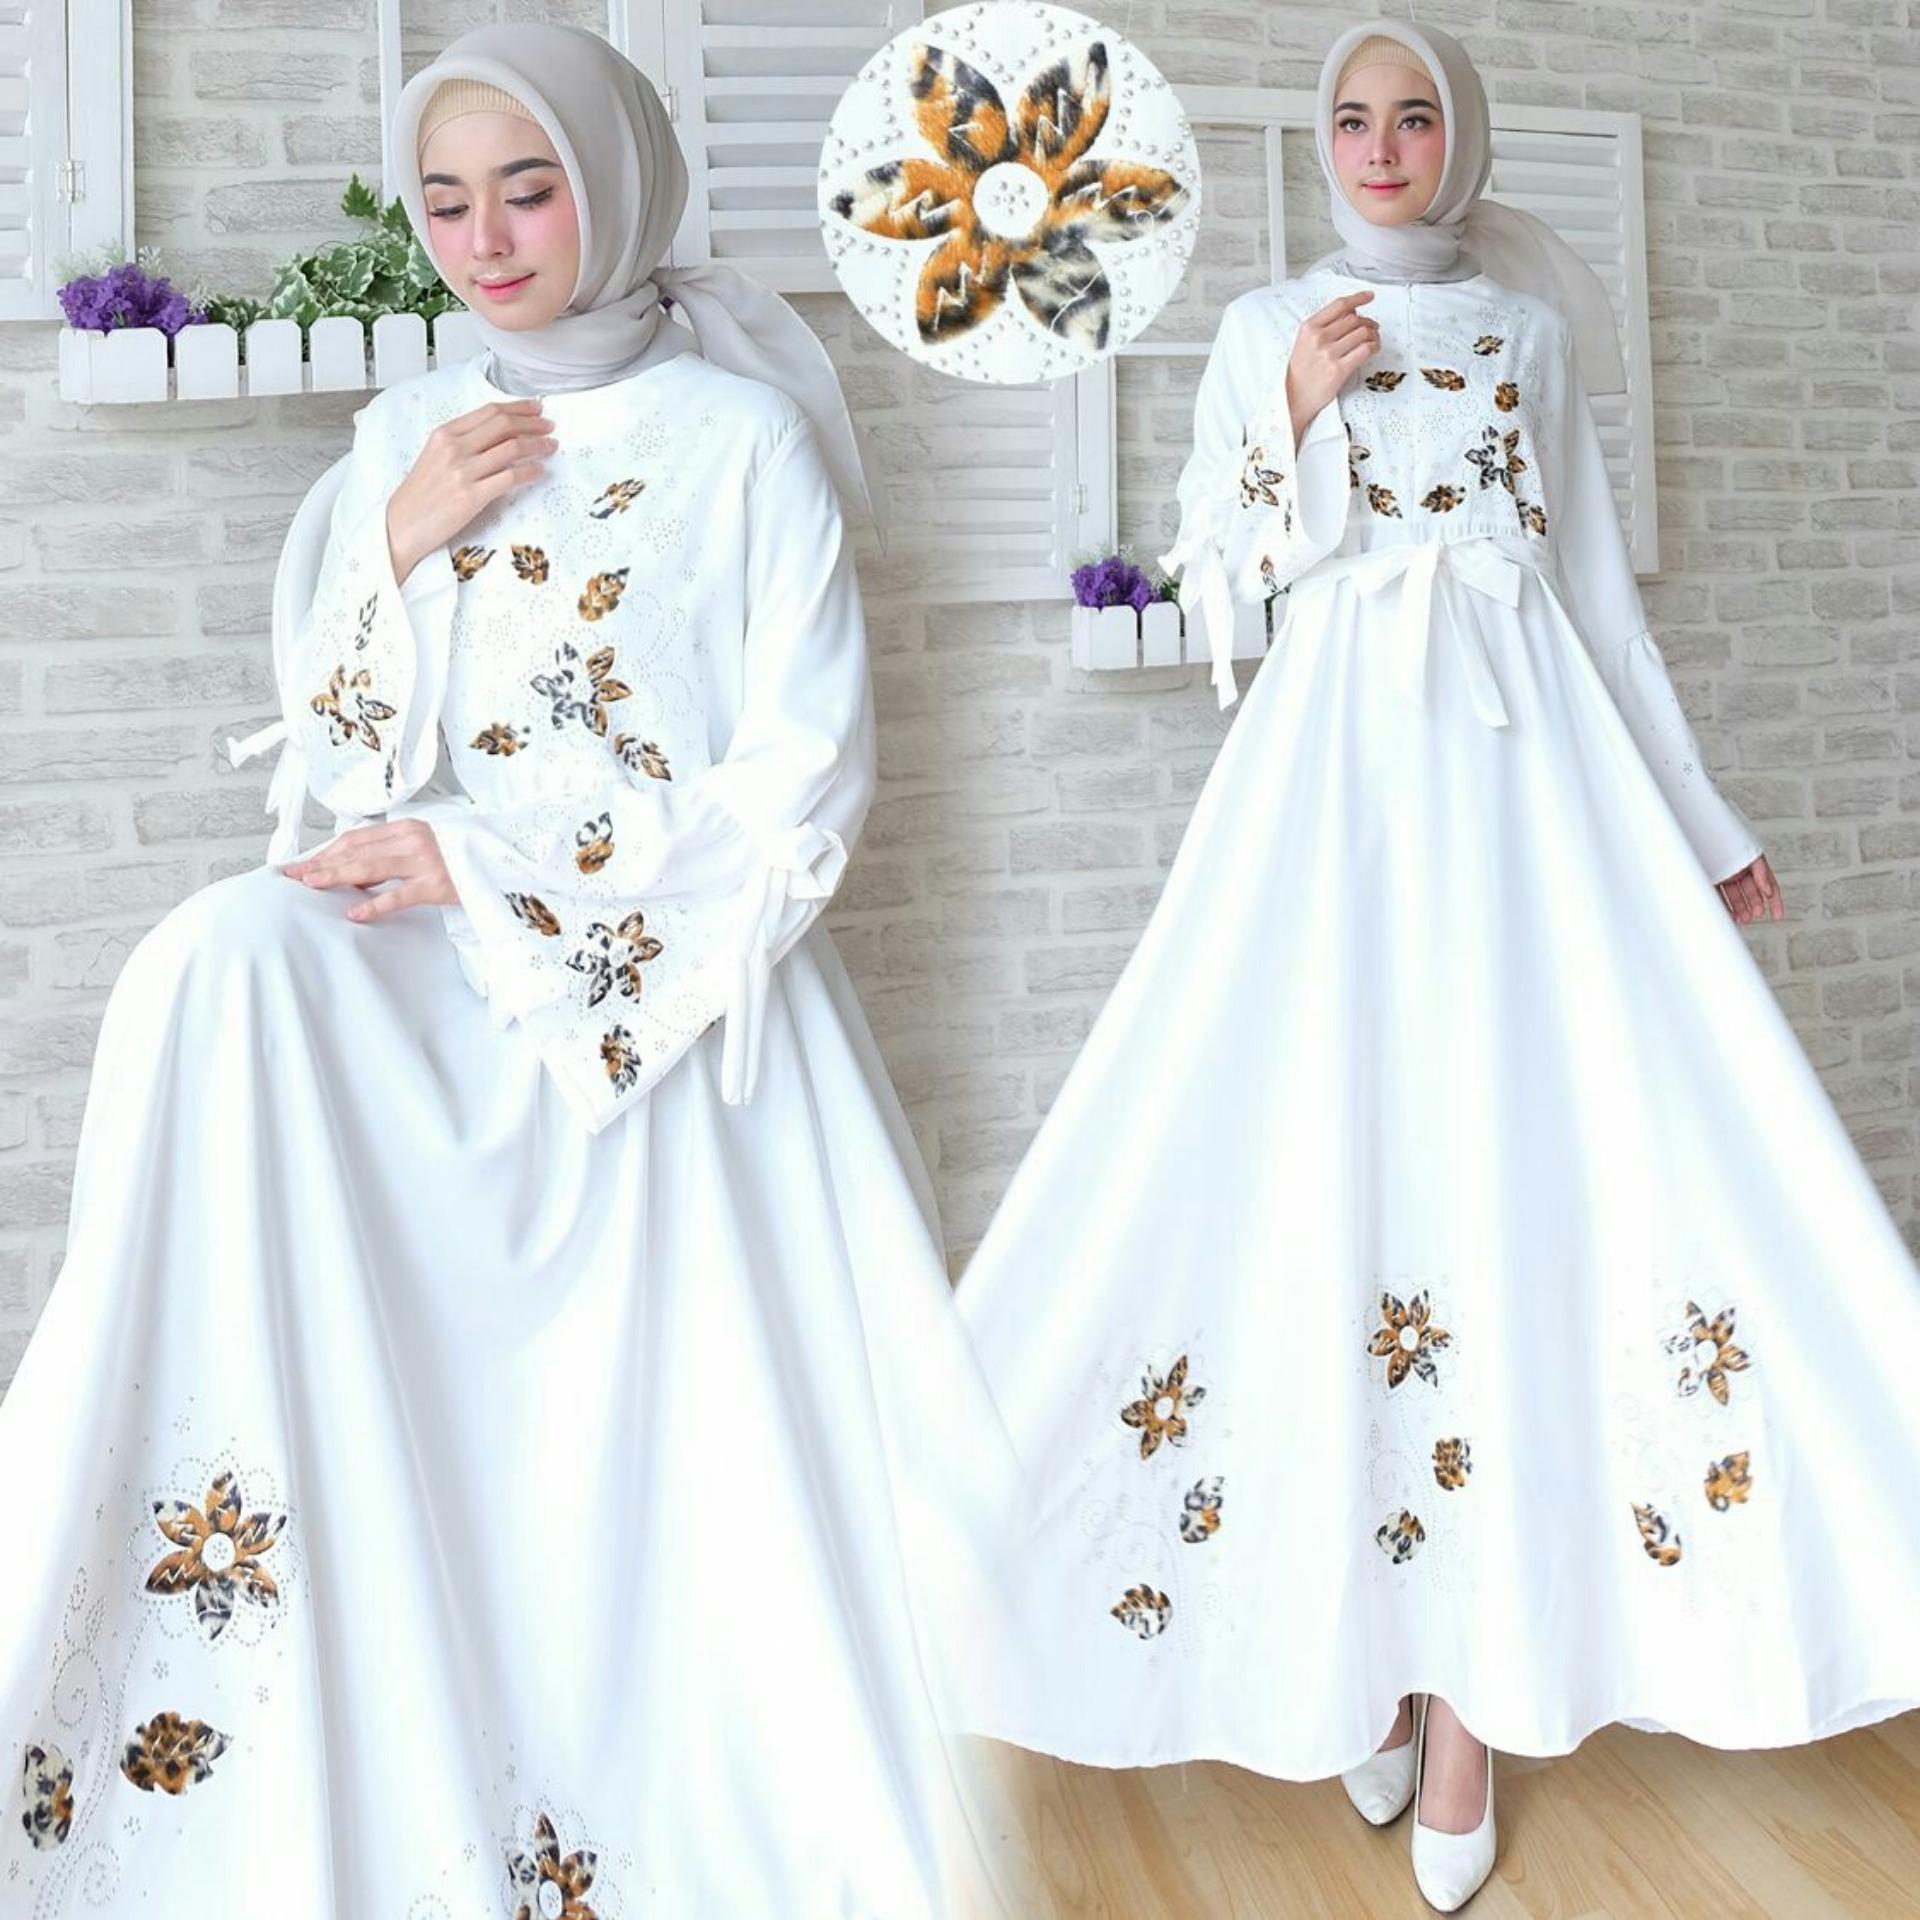 Spesifikasi Snowshop Gamis Syari Flower White Yg Baik